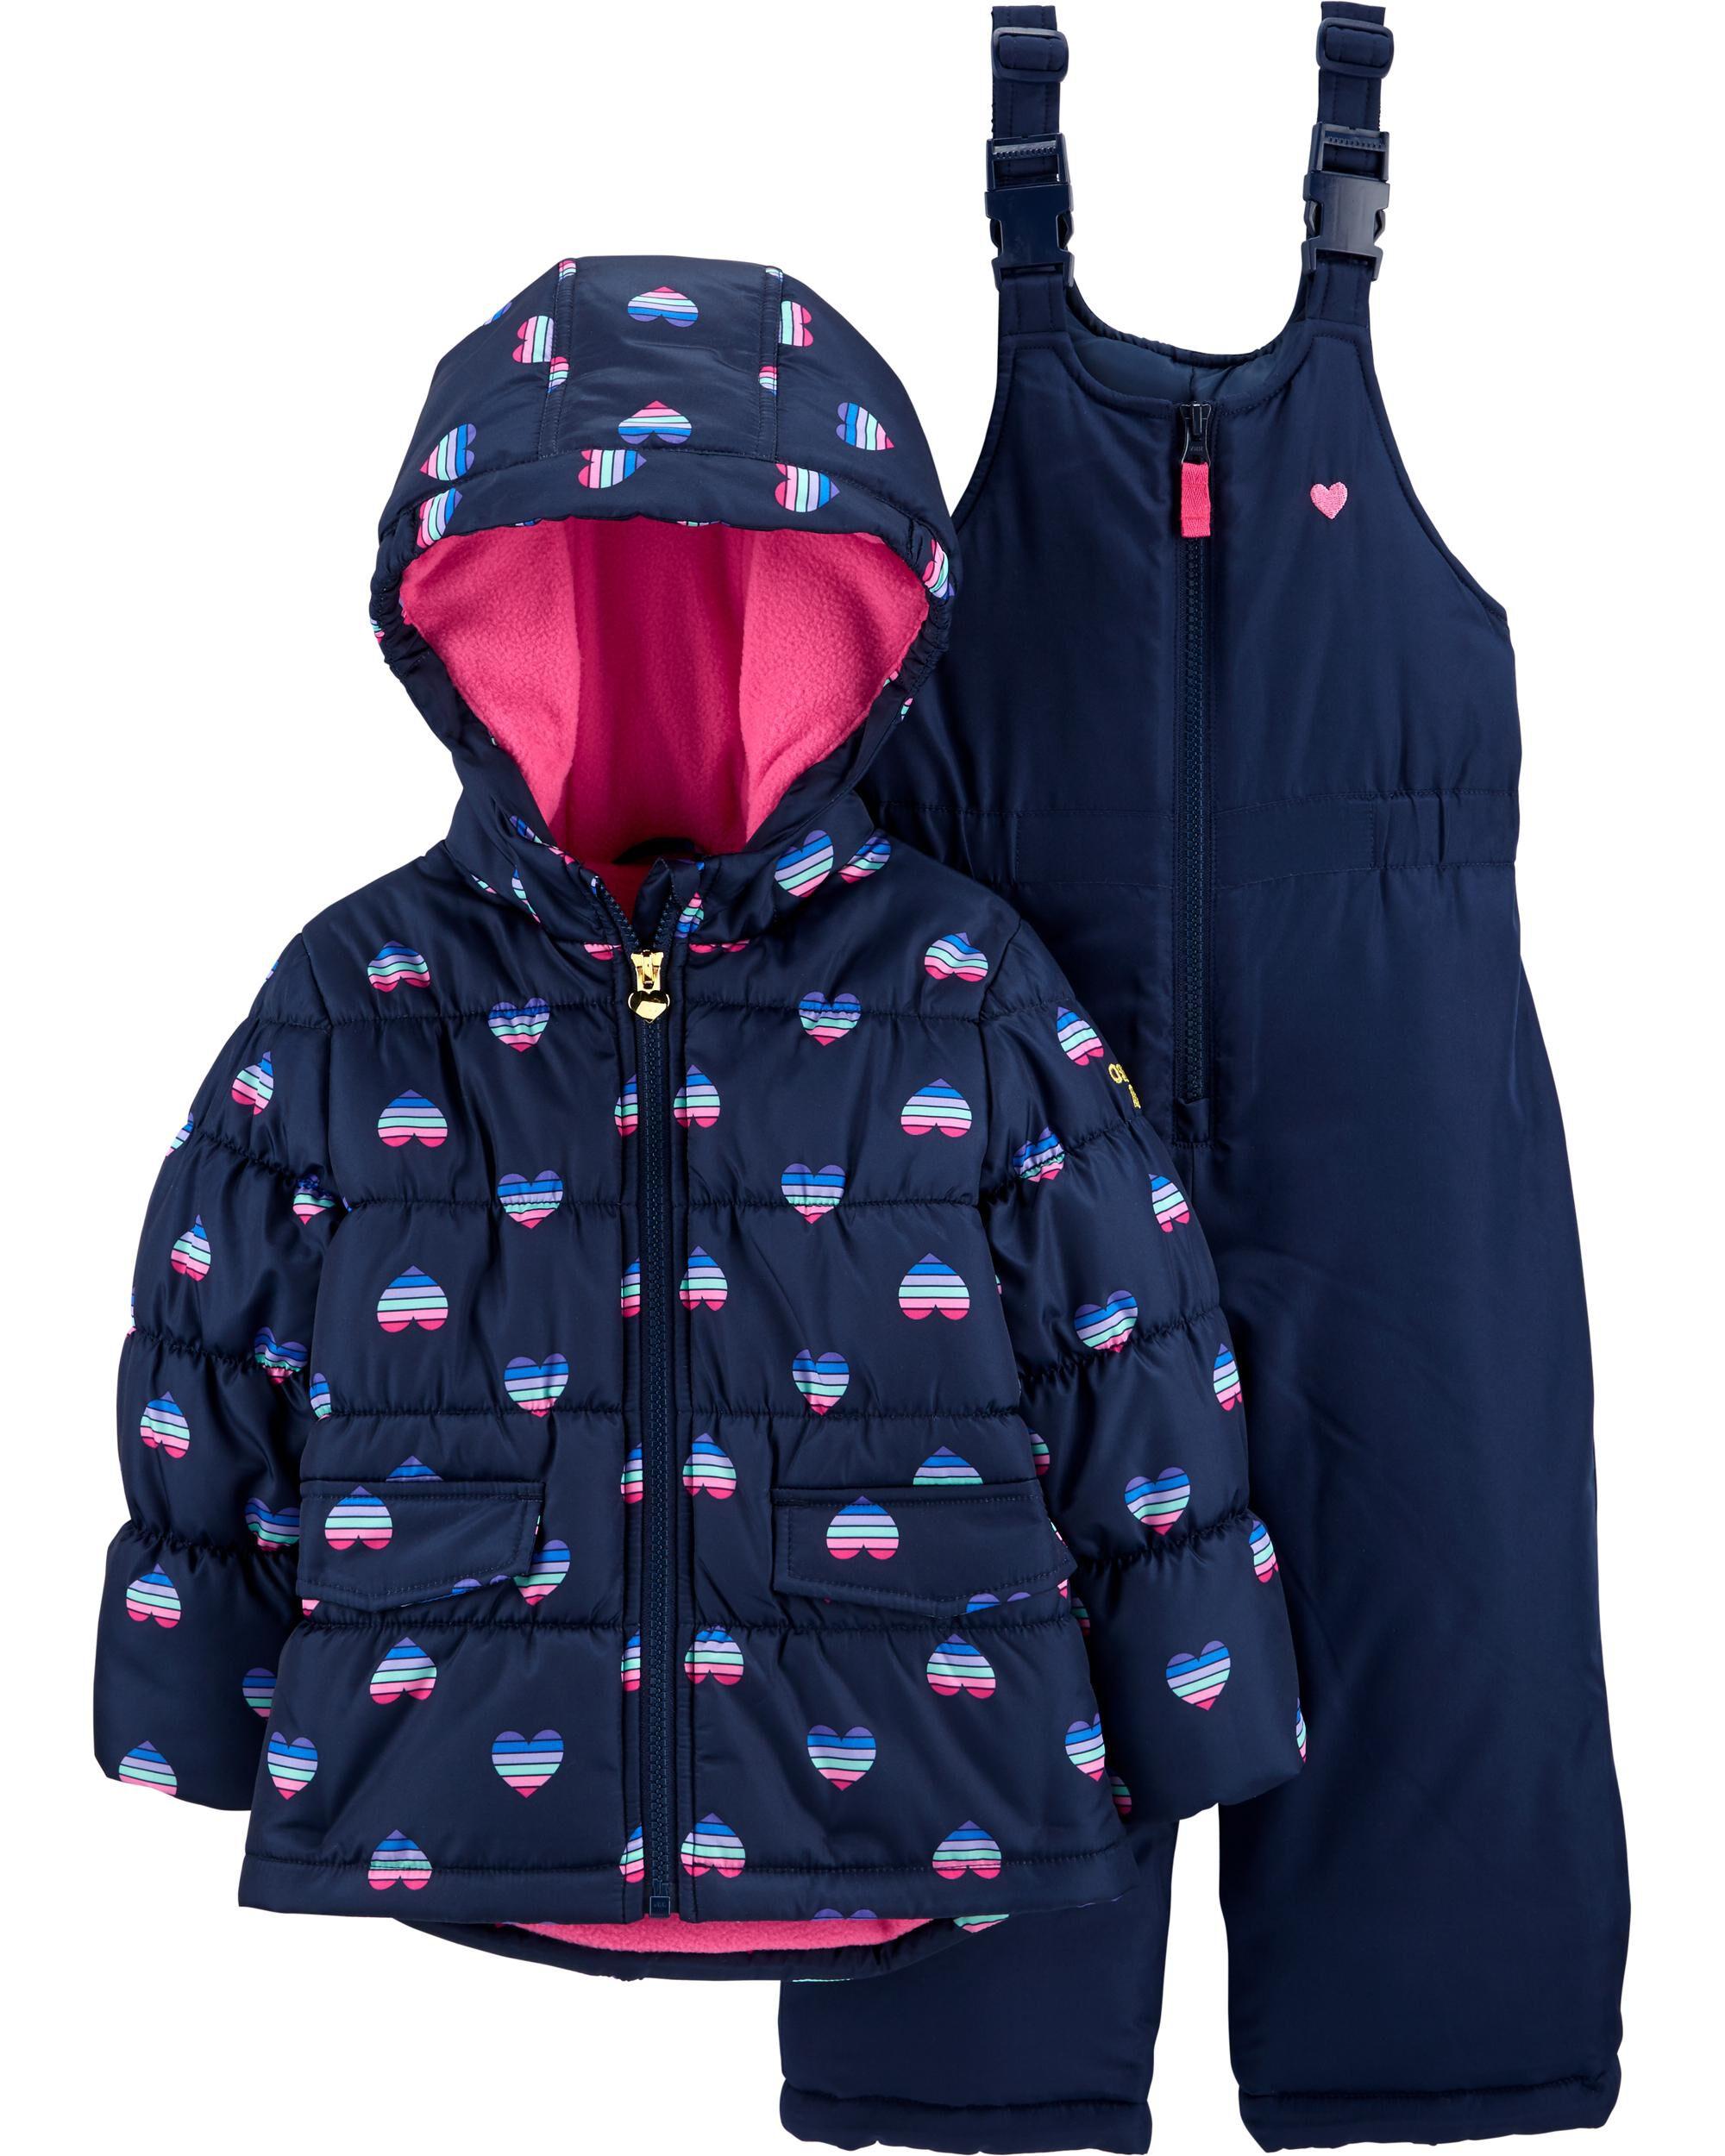 Osh Kosh B/'gosh Infant Girls Navy /& Pink Heart Print Snowsuit Size 12M 18M 24M